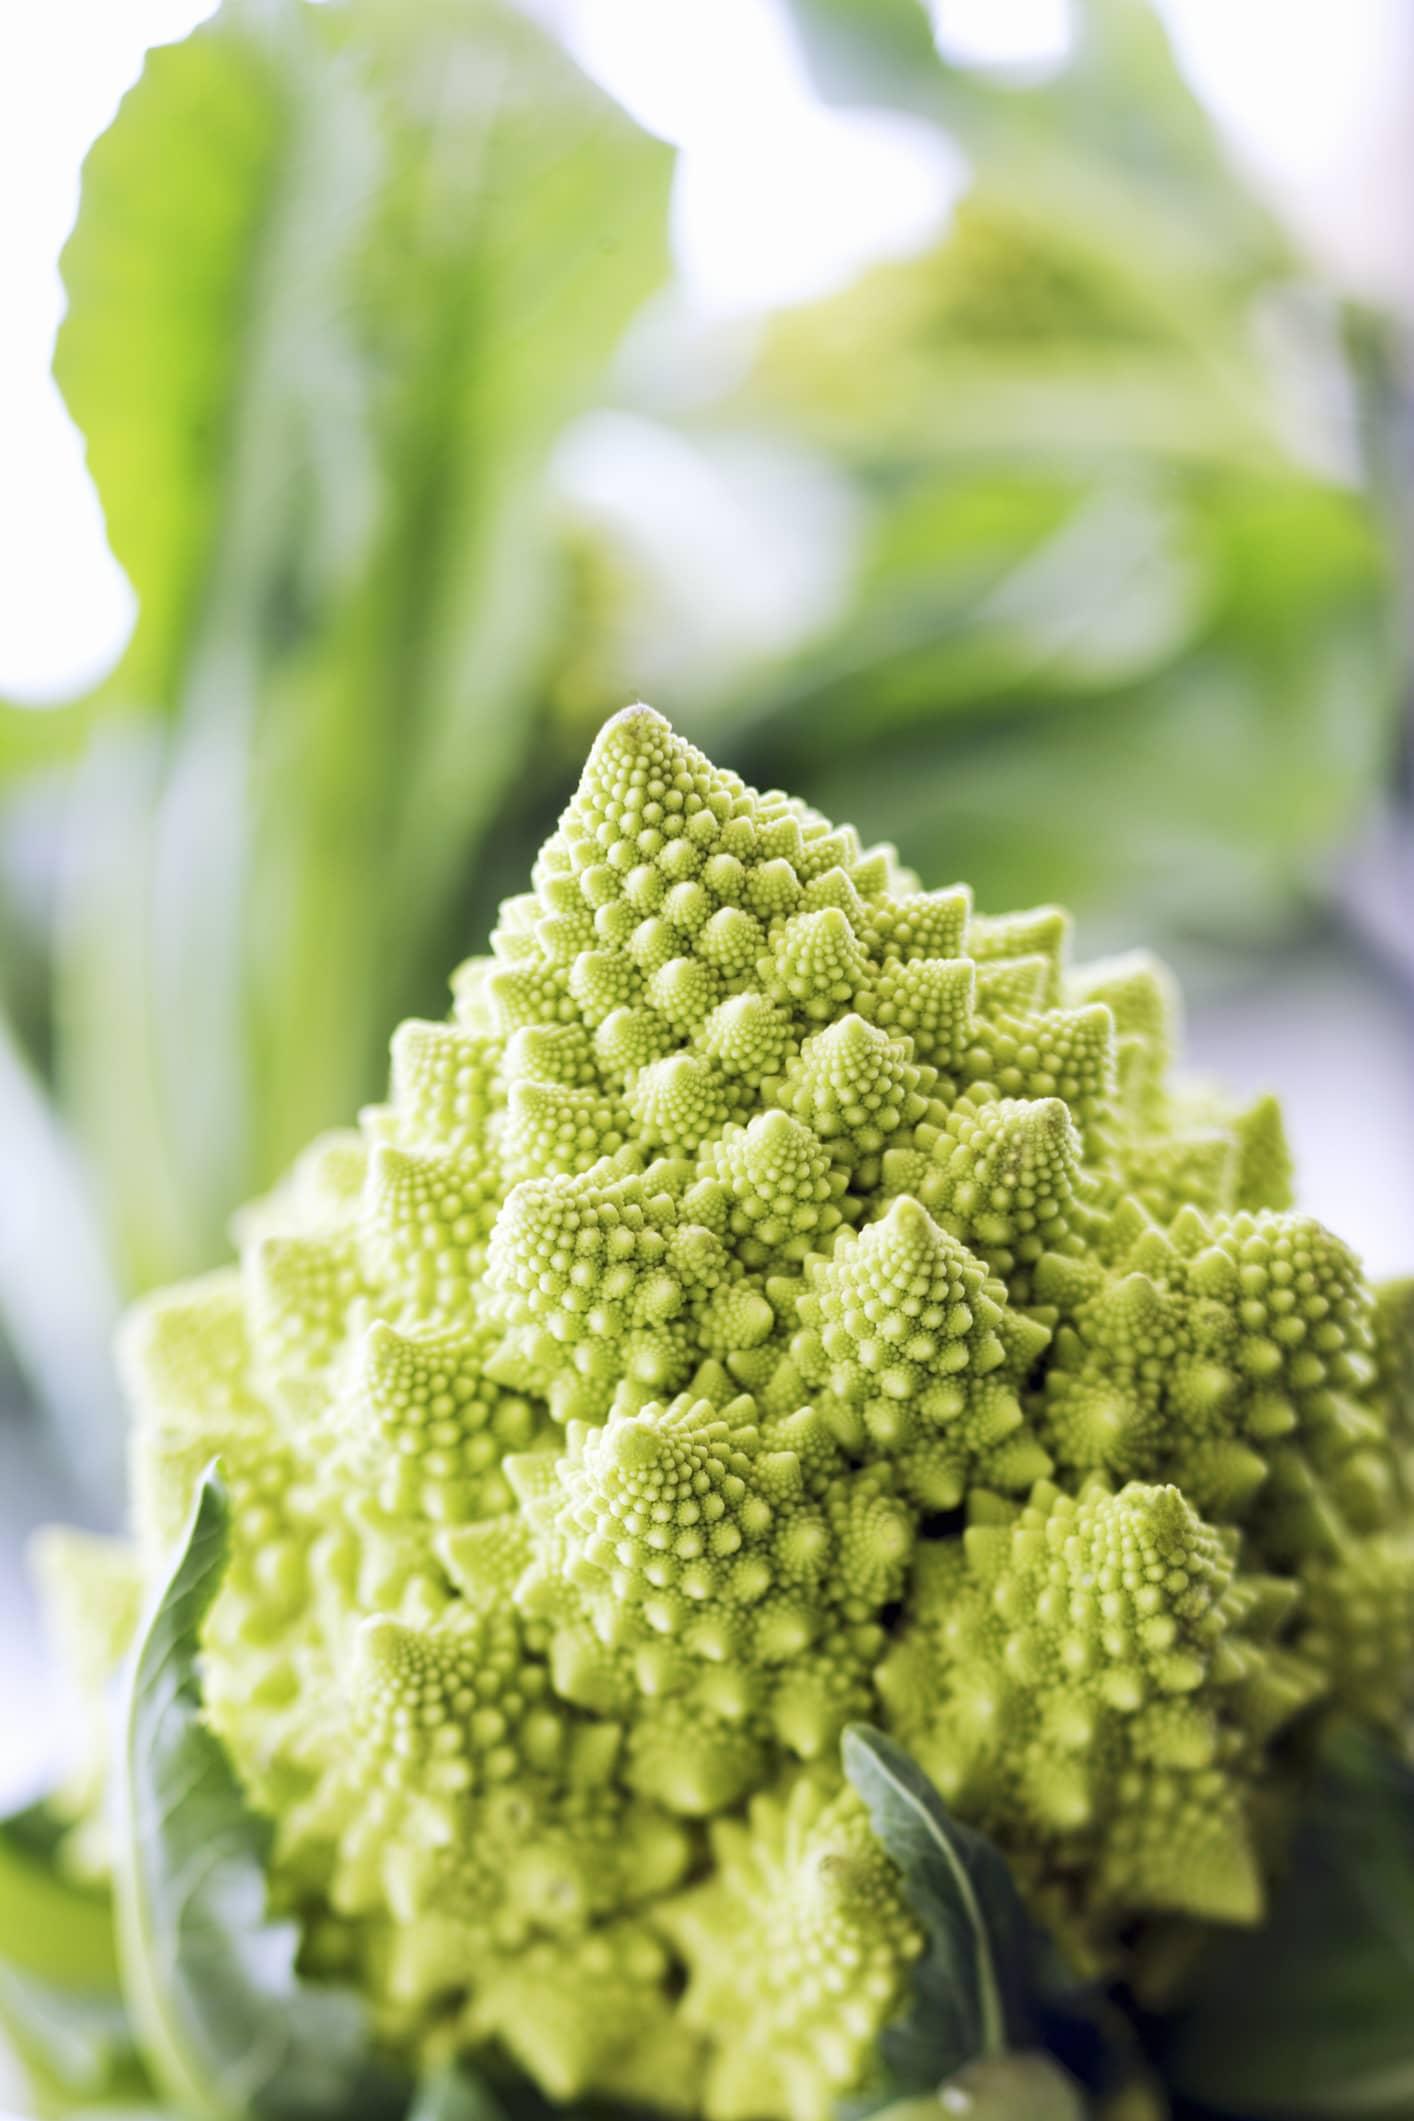 Romanesco broccoli (close-up)